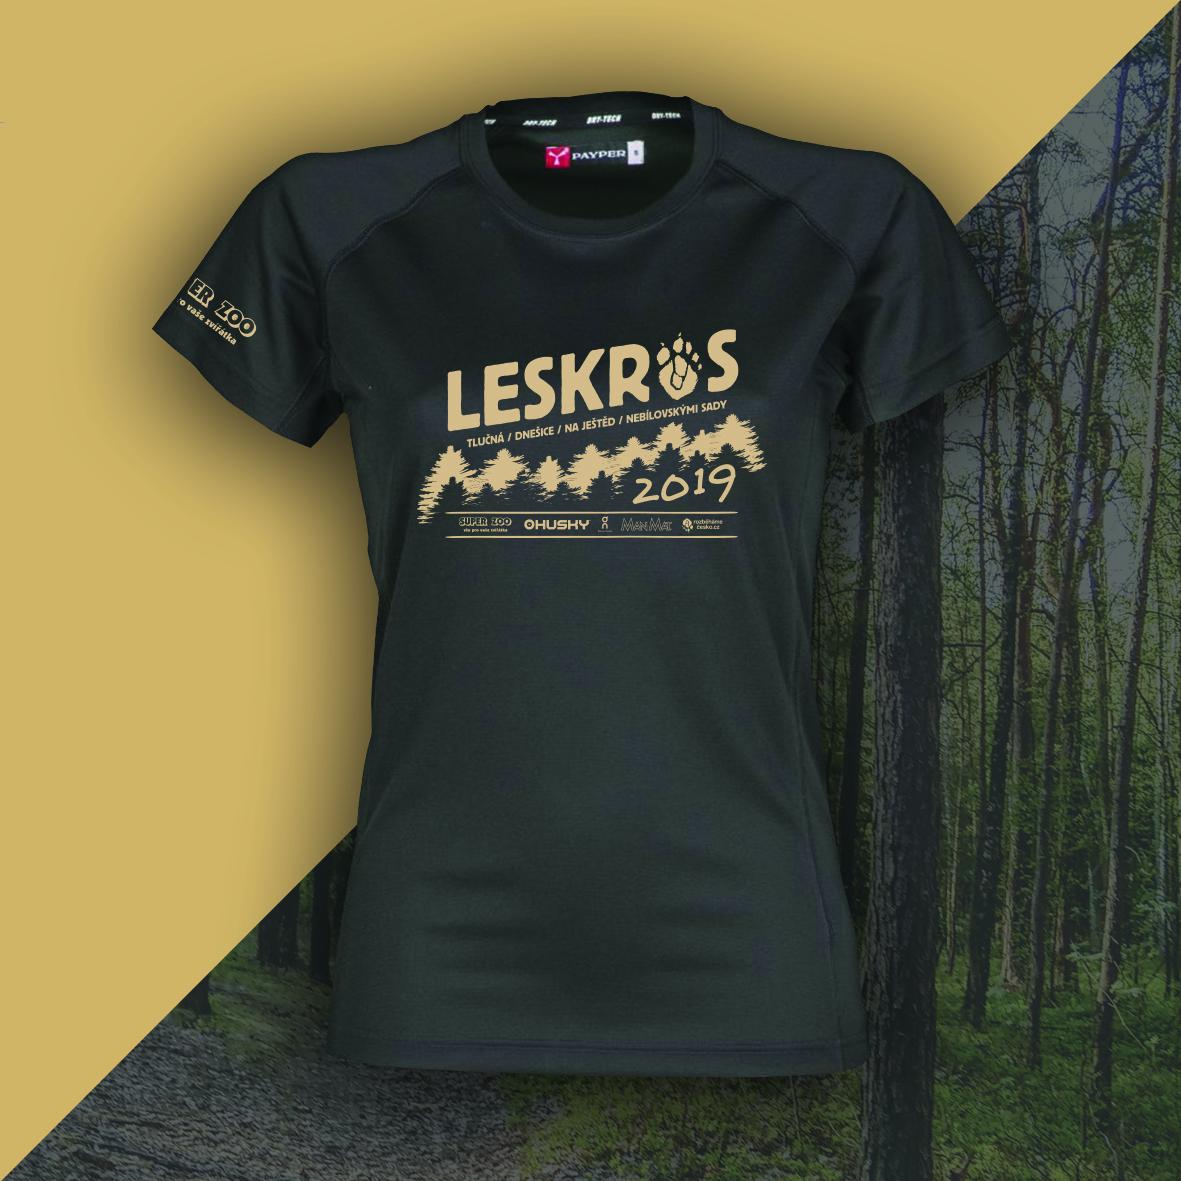 LESKROS - TRIČKO/ČELENKA/PODSTAVEC 00142